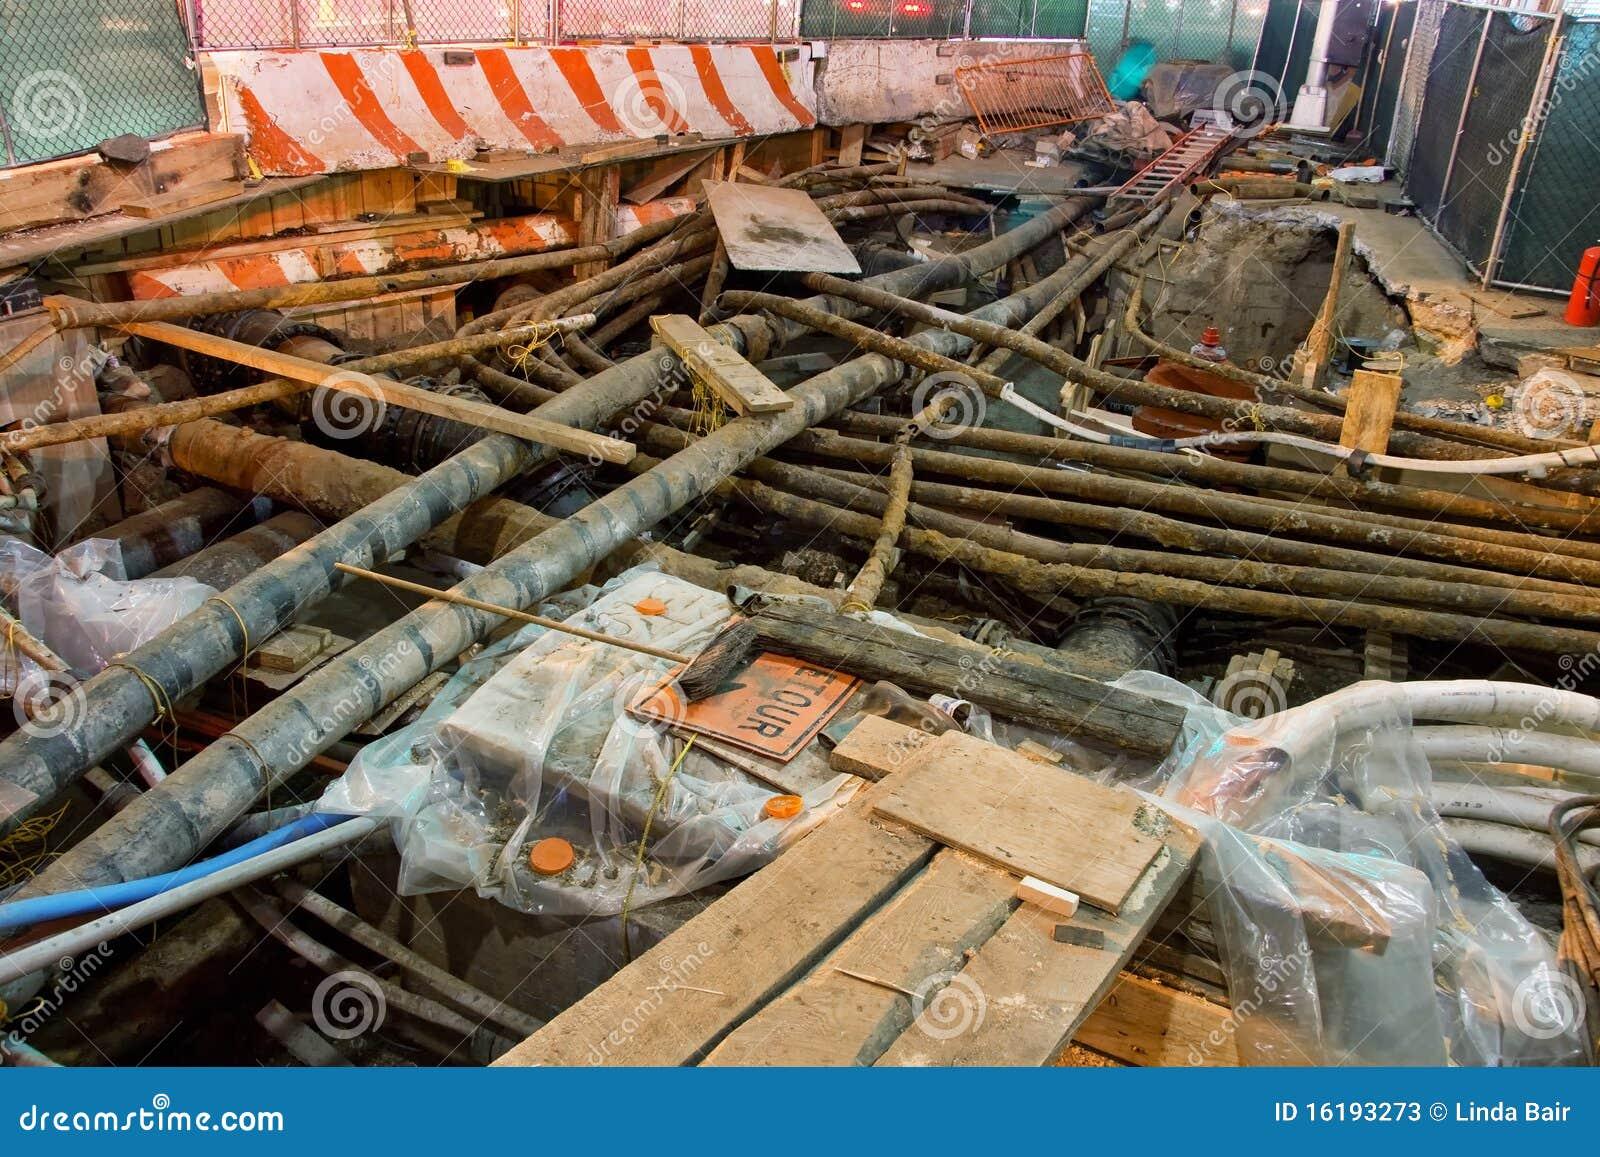 Underground utility repairs stock image of urban